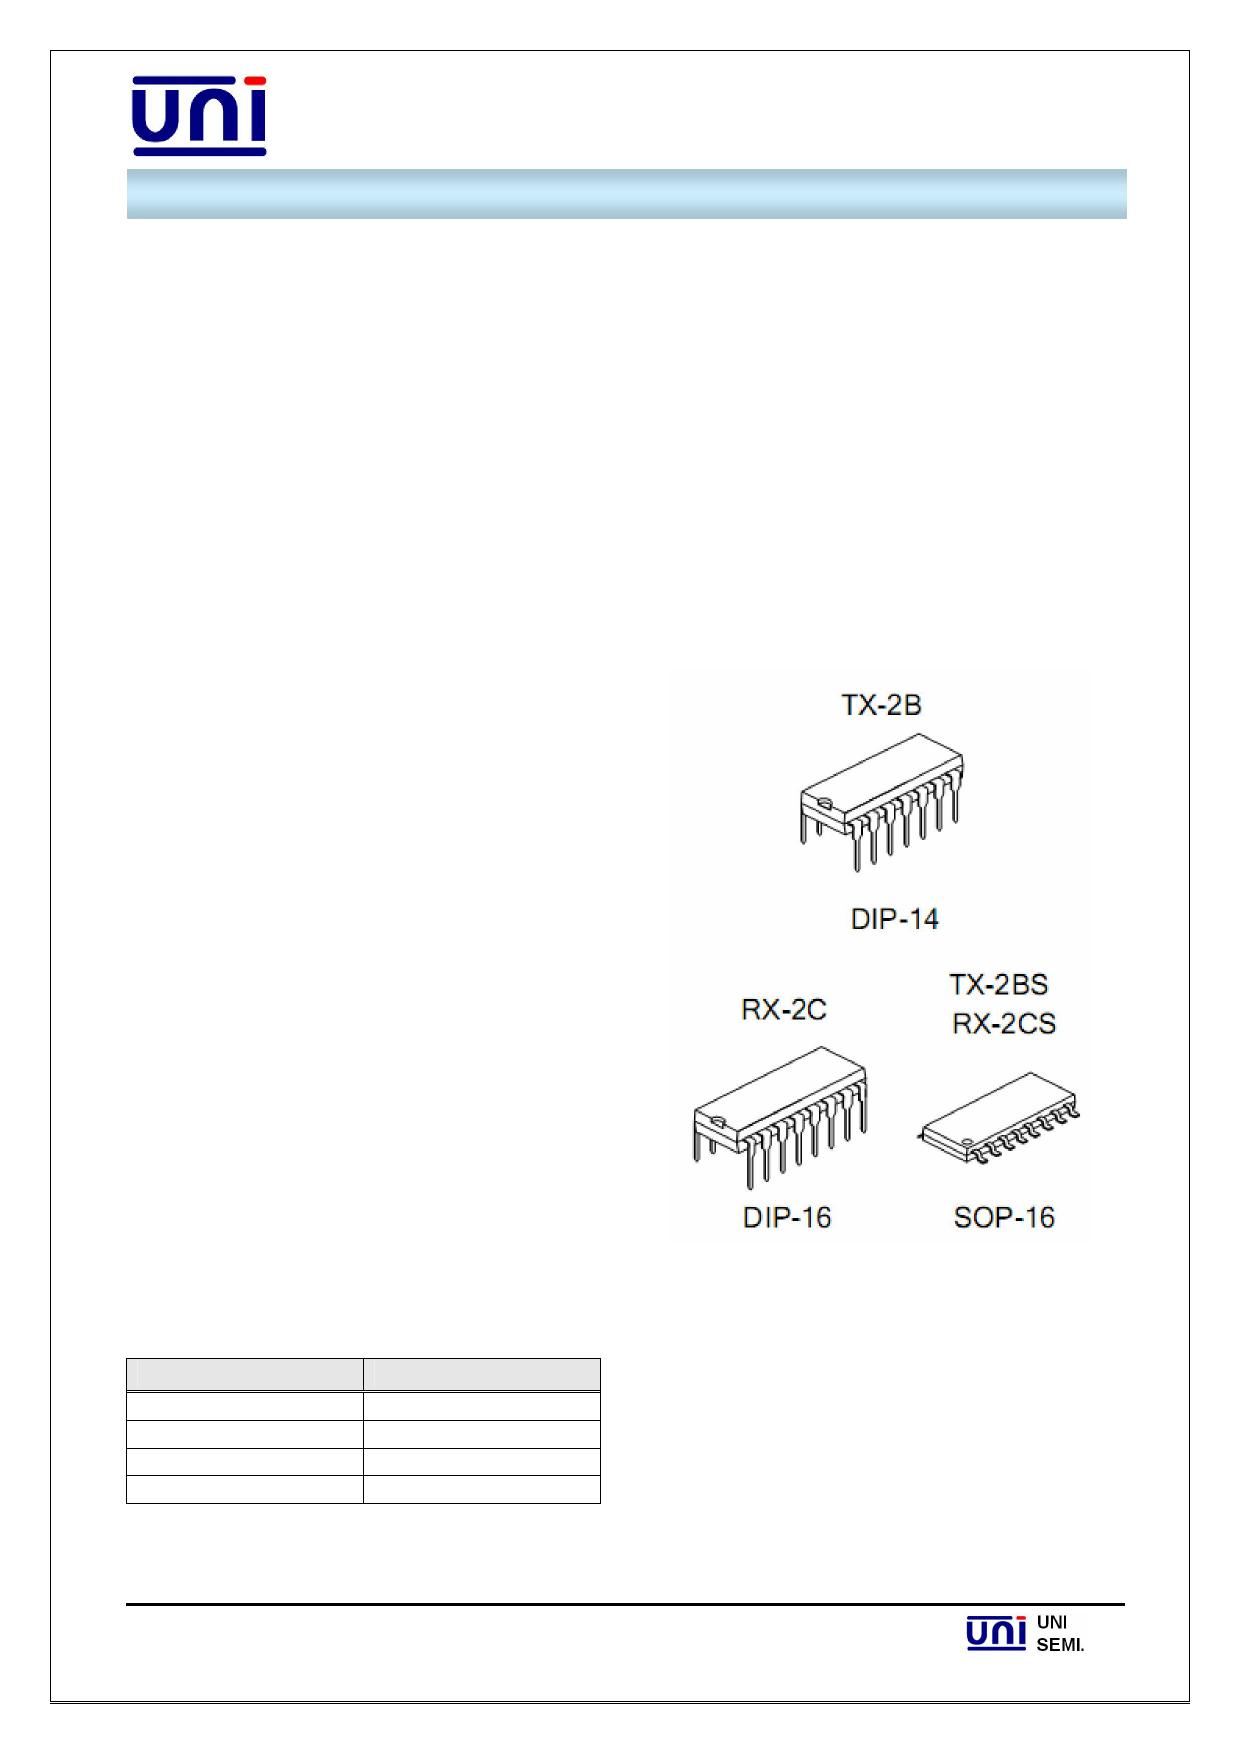 RX-2C Datasheet